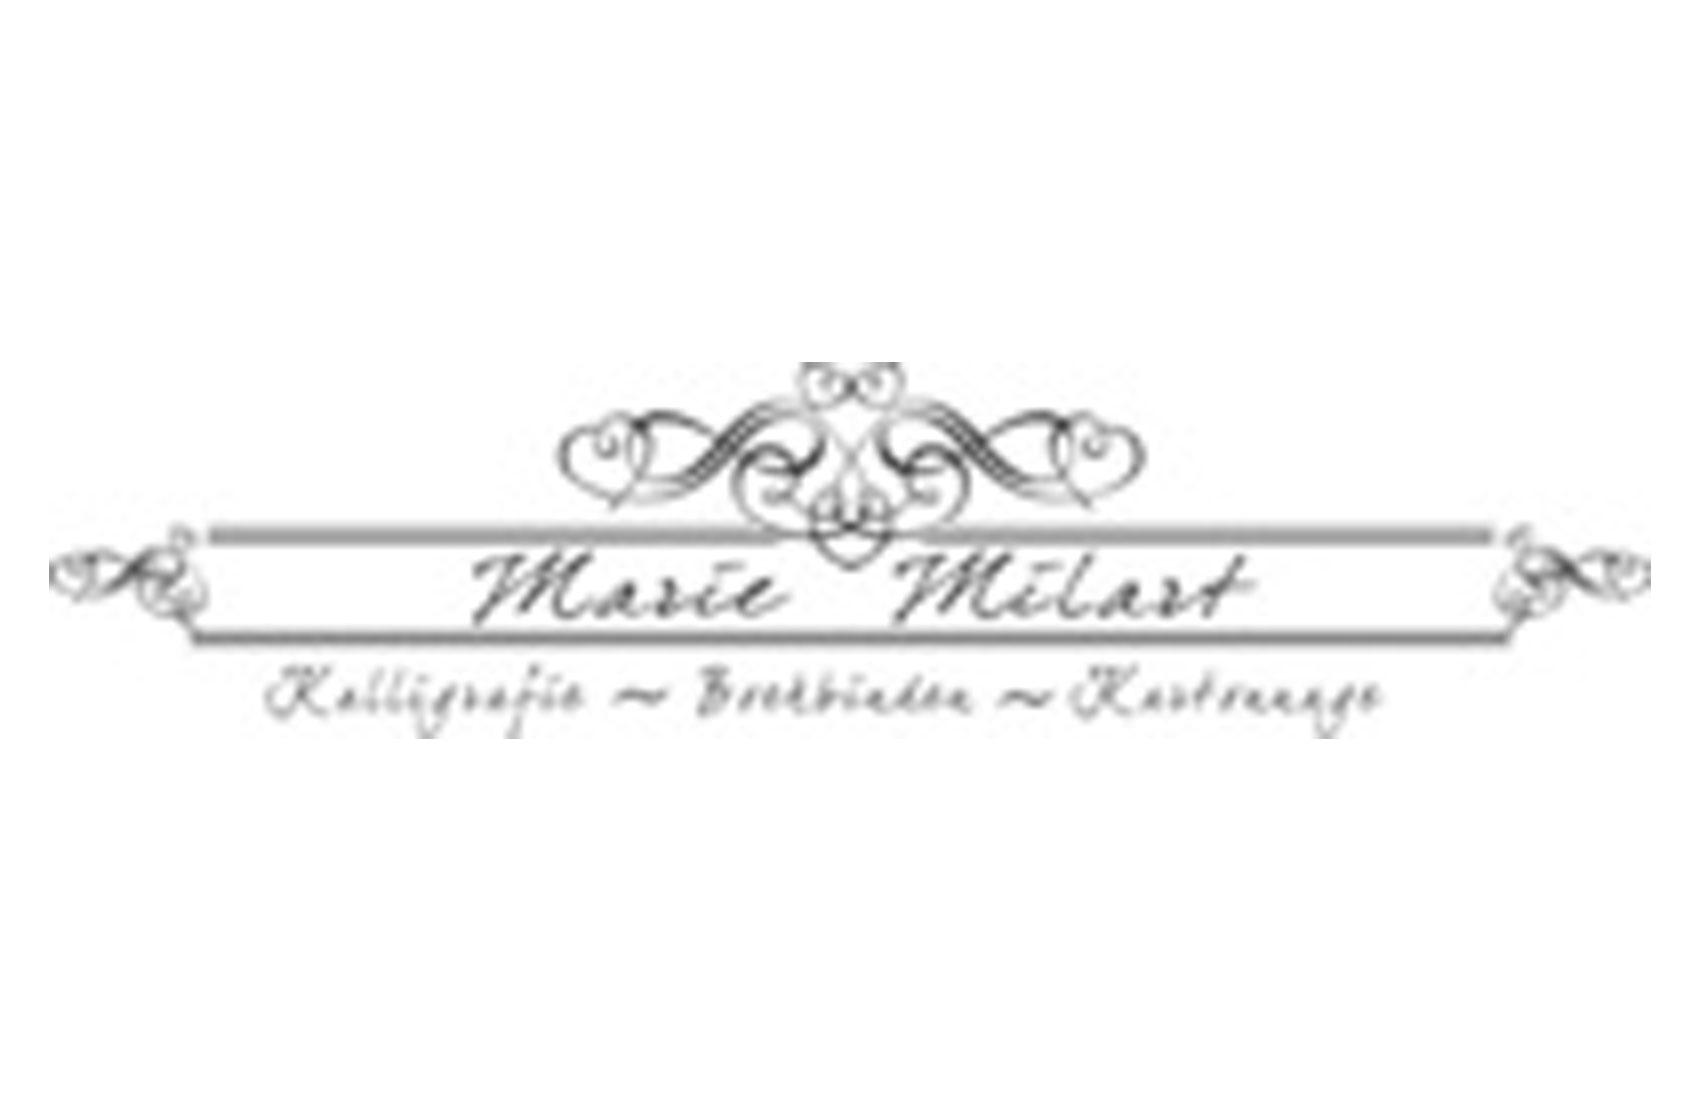 Papierhuis Marie Milart